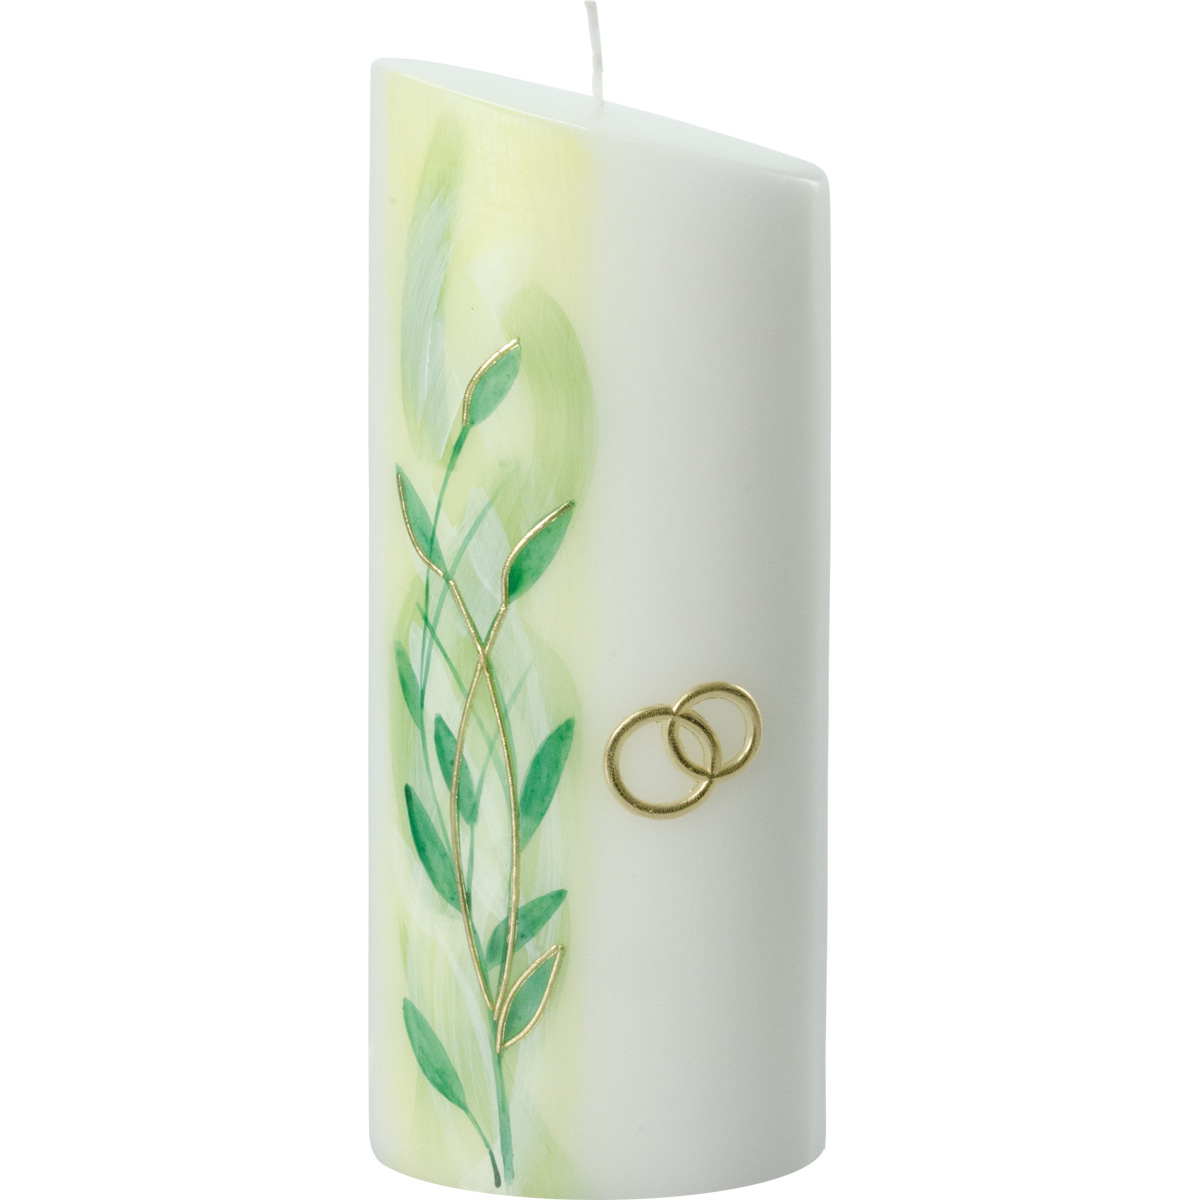 Hochzeitskerze, 2279, Oval 230x90x60, Blätterranke, grüntöne, gold